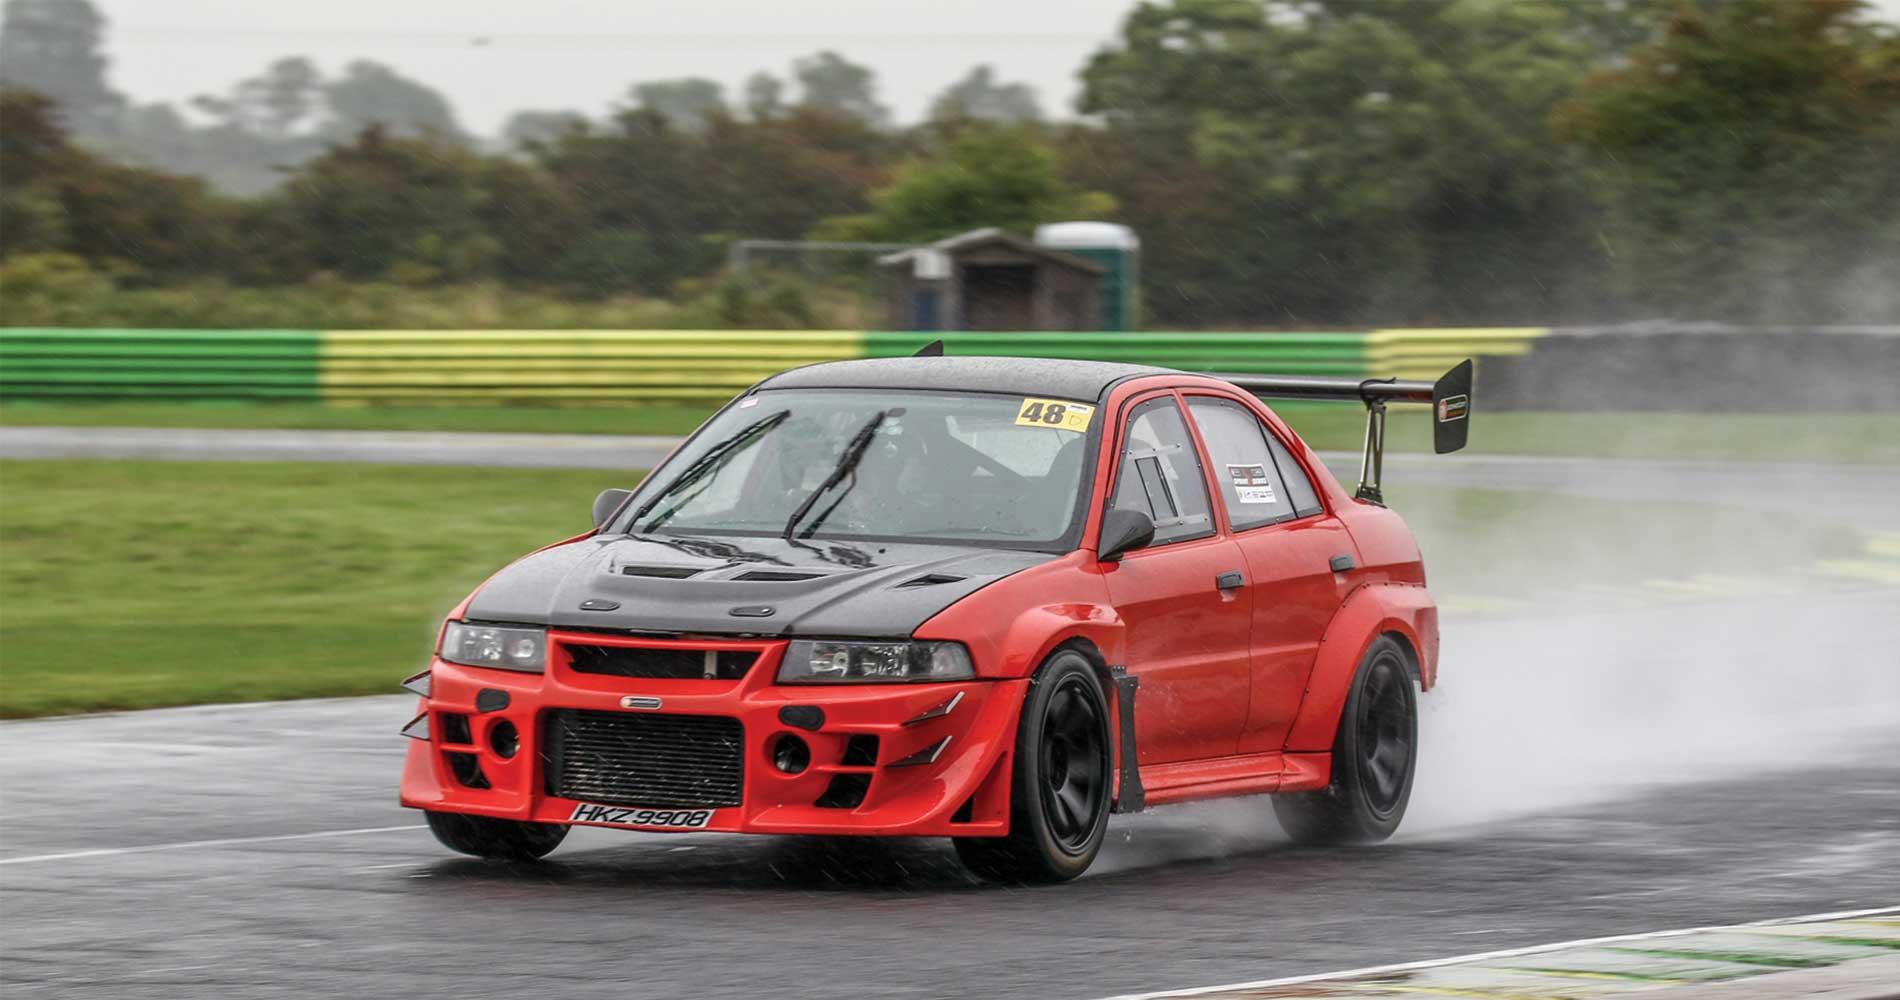 2016-pace-ward-mlr-sprint-series-round-6-cadwell-park-report-motorsportdays-test-days-6